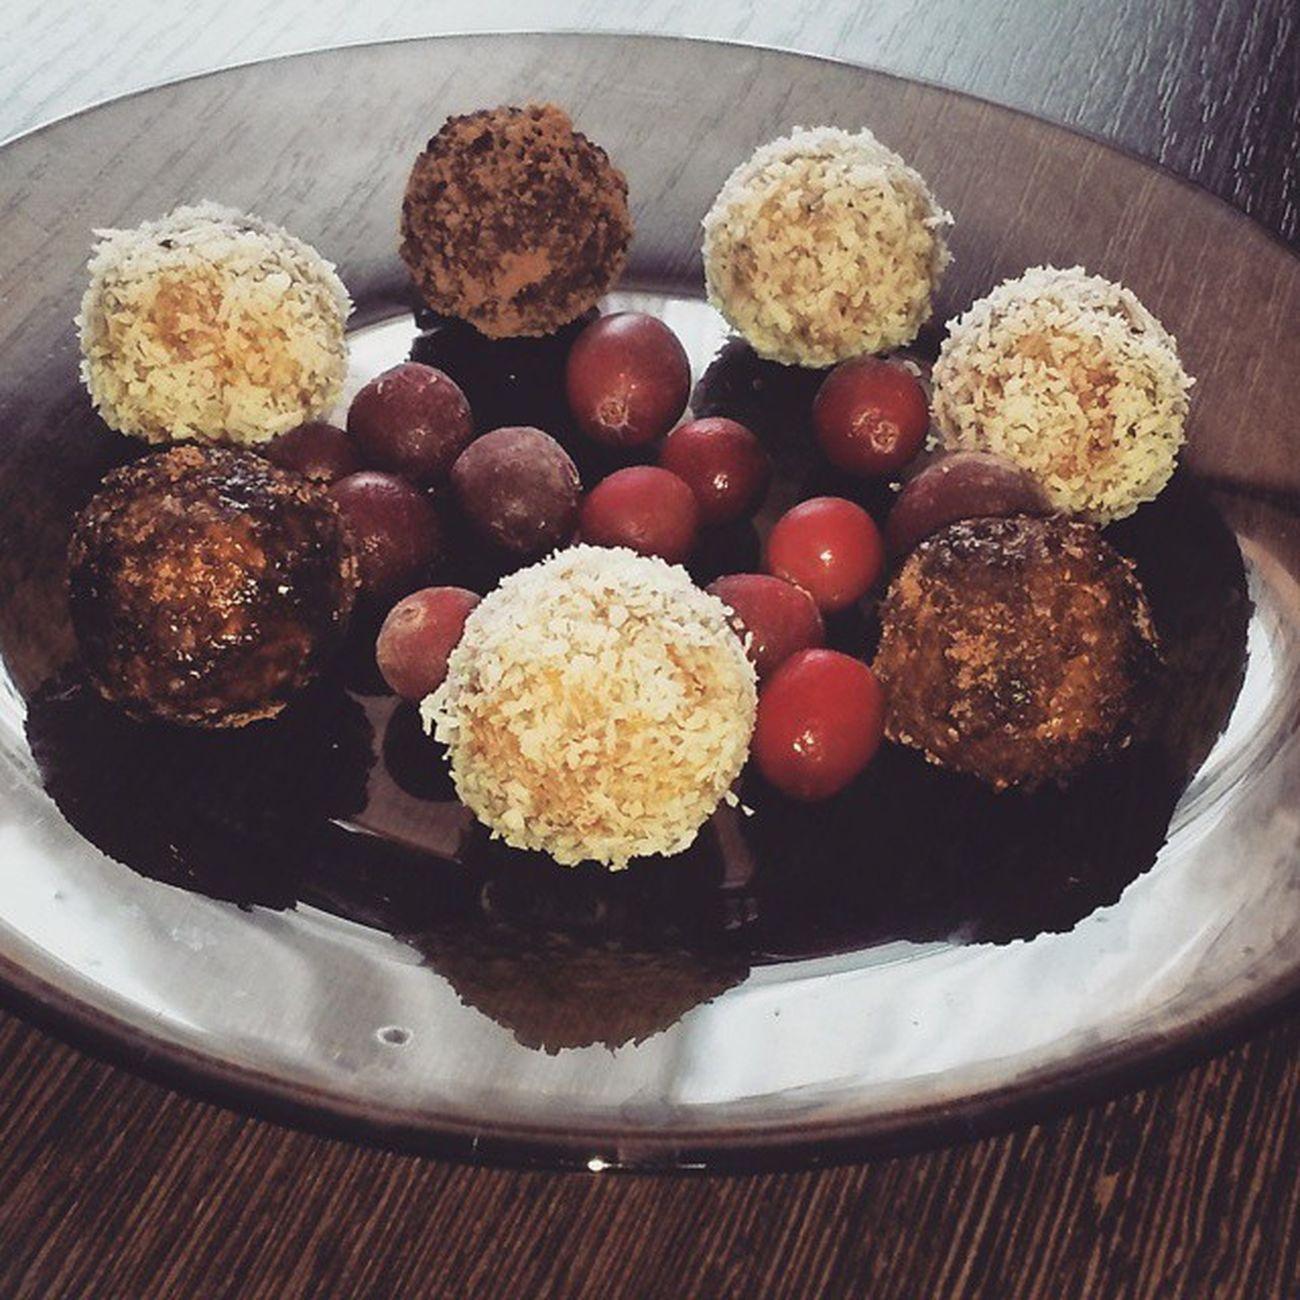 Вкуснятина какая получилась😌 Tasty Candy Likeit Food Goodtime Sweet Eat Coconut пп Cranberries Cocoa